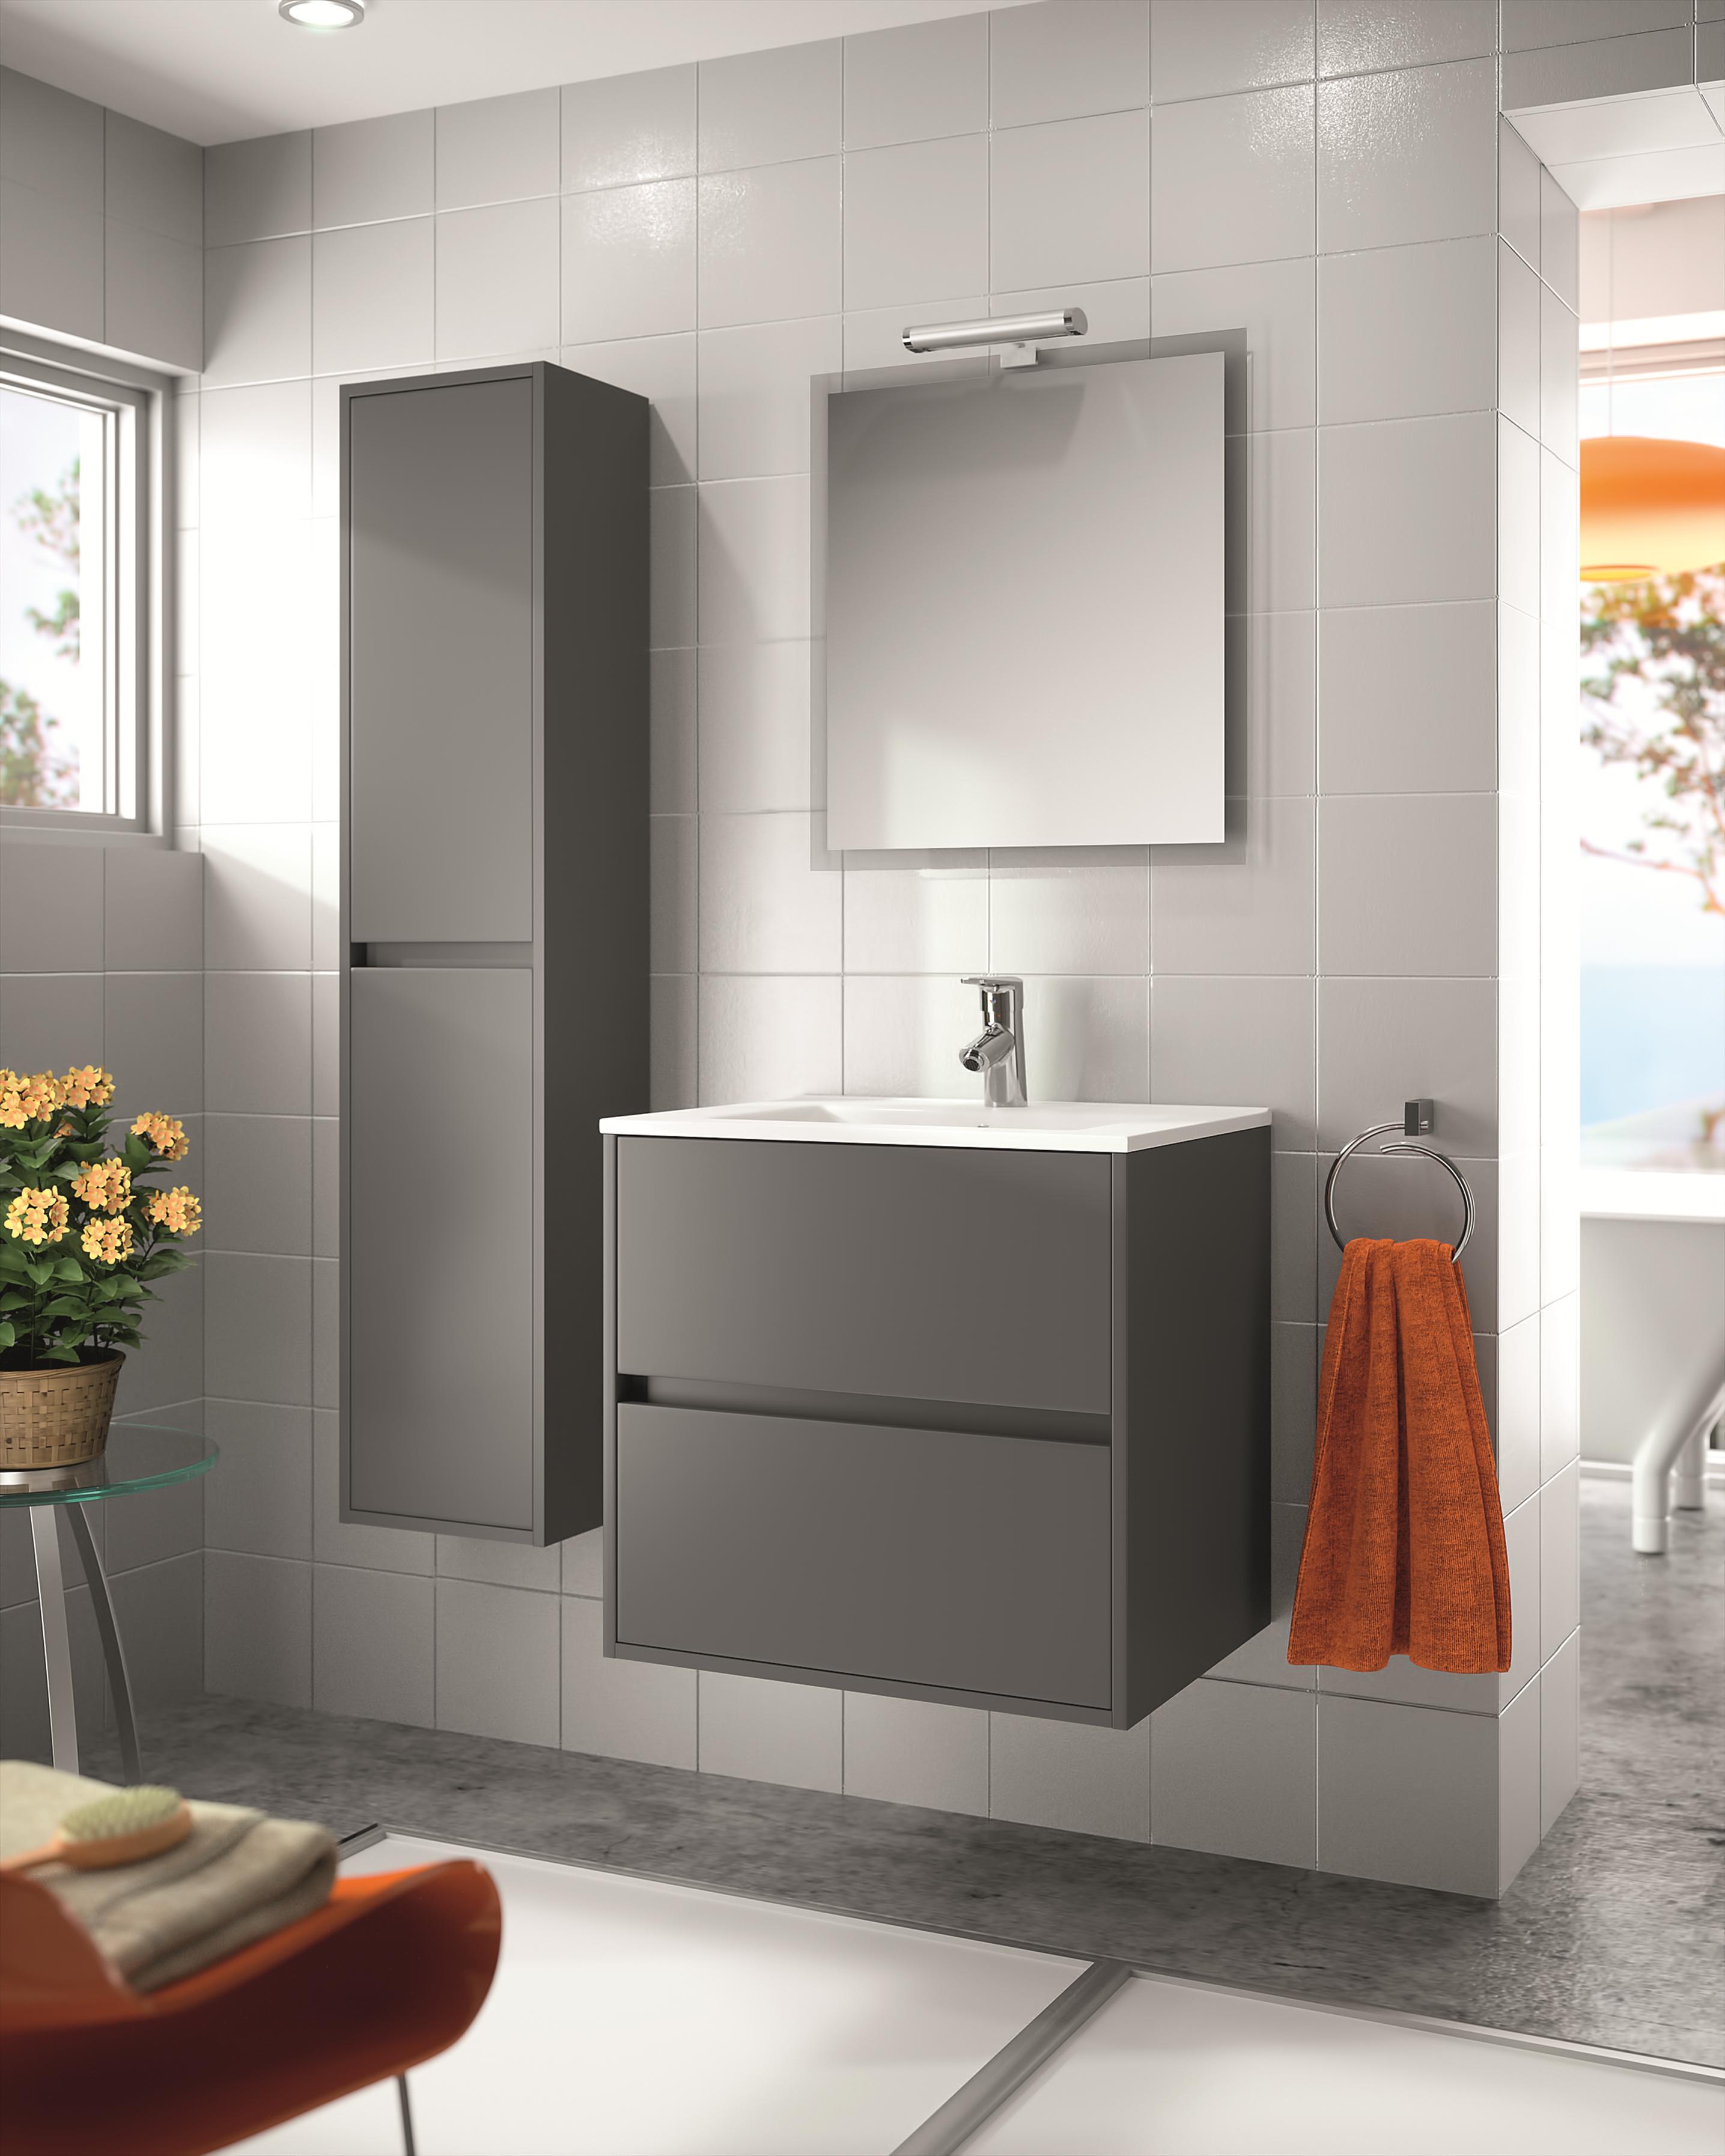 Ensemble meuble noja 700 - Panneau acrylique salle de bain pas cher ...